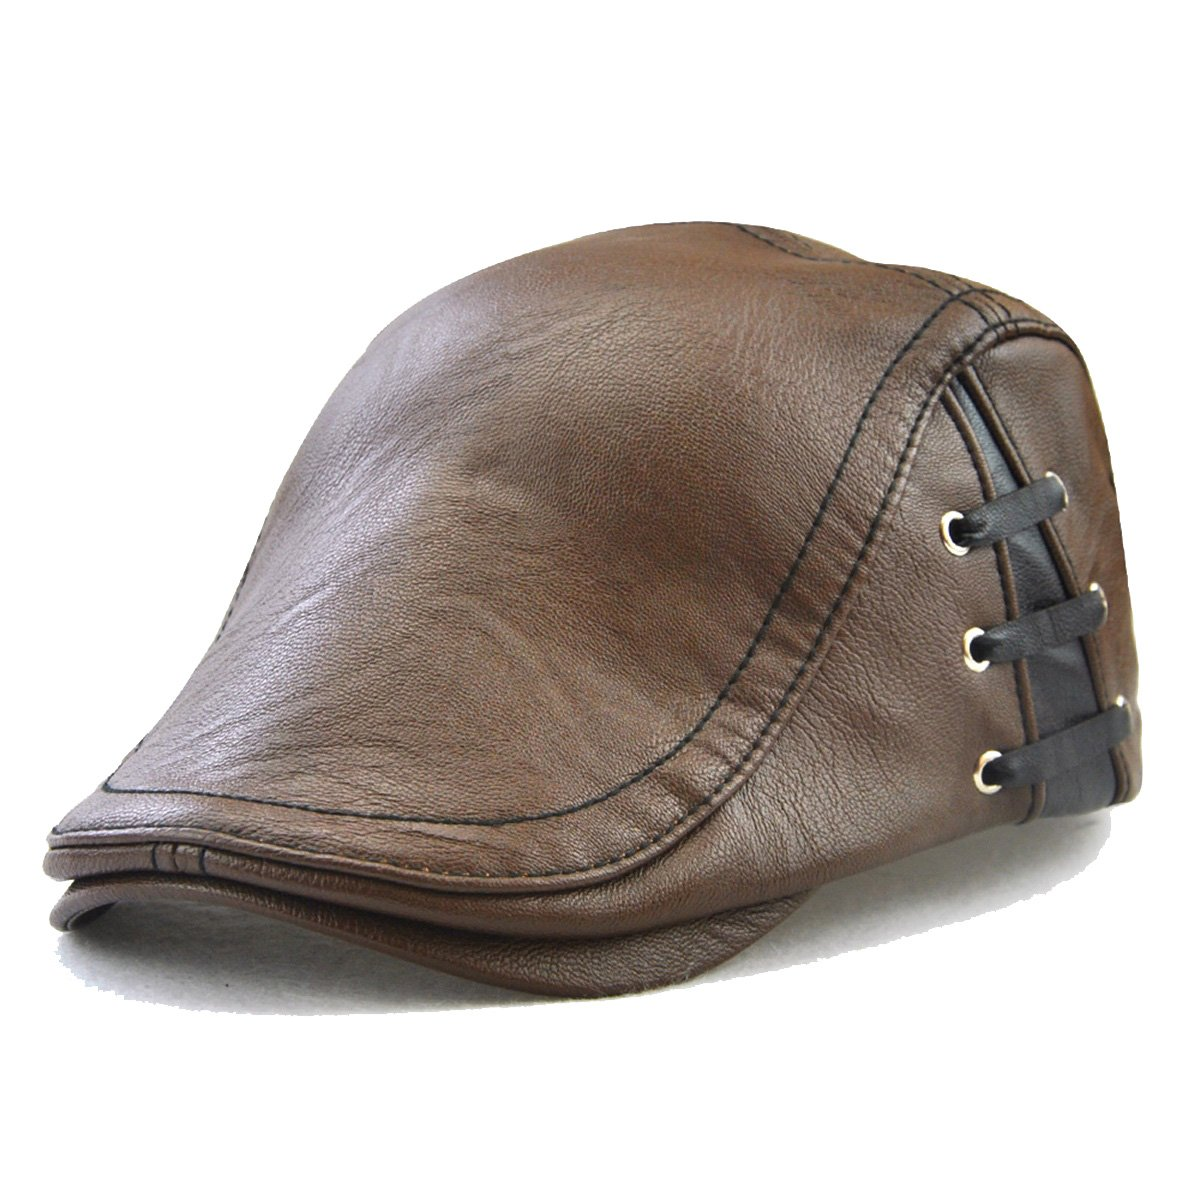 407ffab5fc6 ... Under Armour Accessories 1299899 · FayTop Unisex Outdoor Baseball Hat  Cap Adjustable Snapback Cap Hunting Cap for Men Women V61B039-